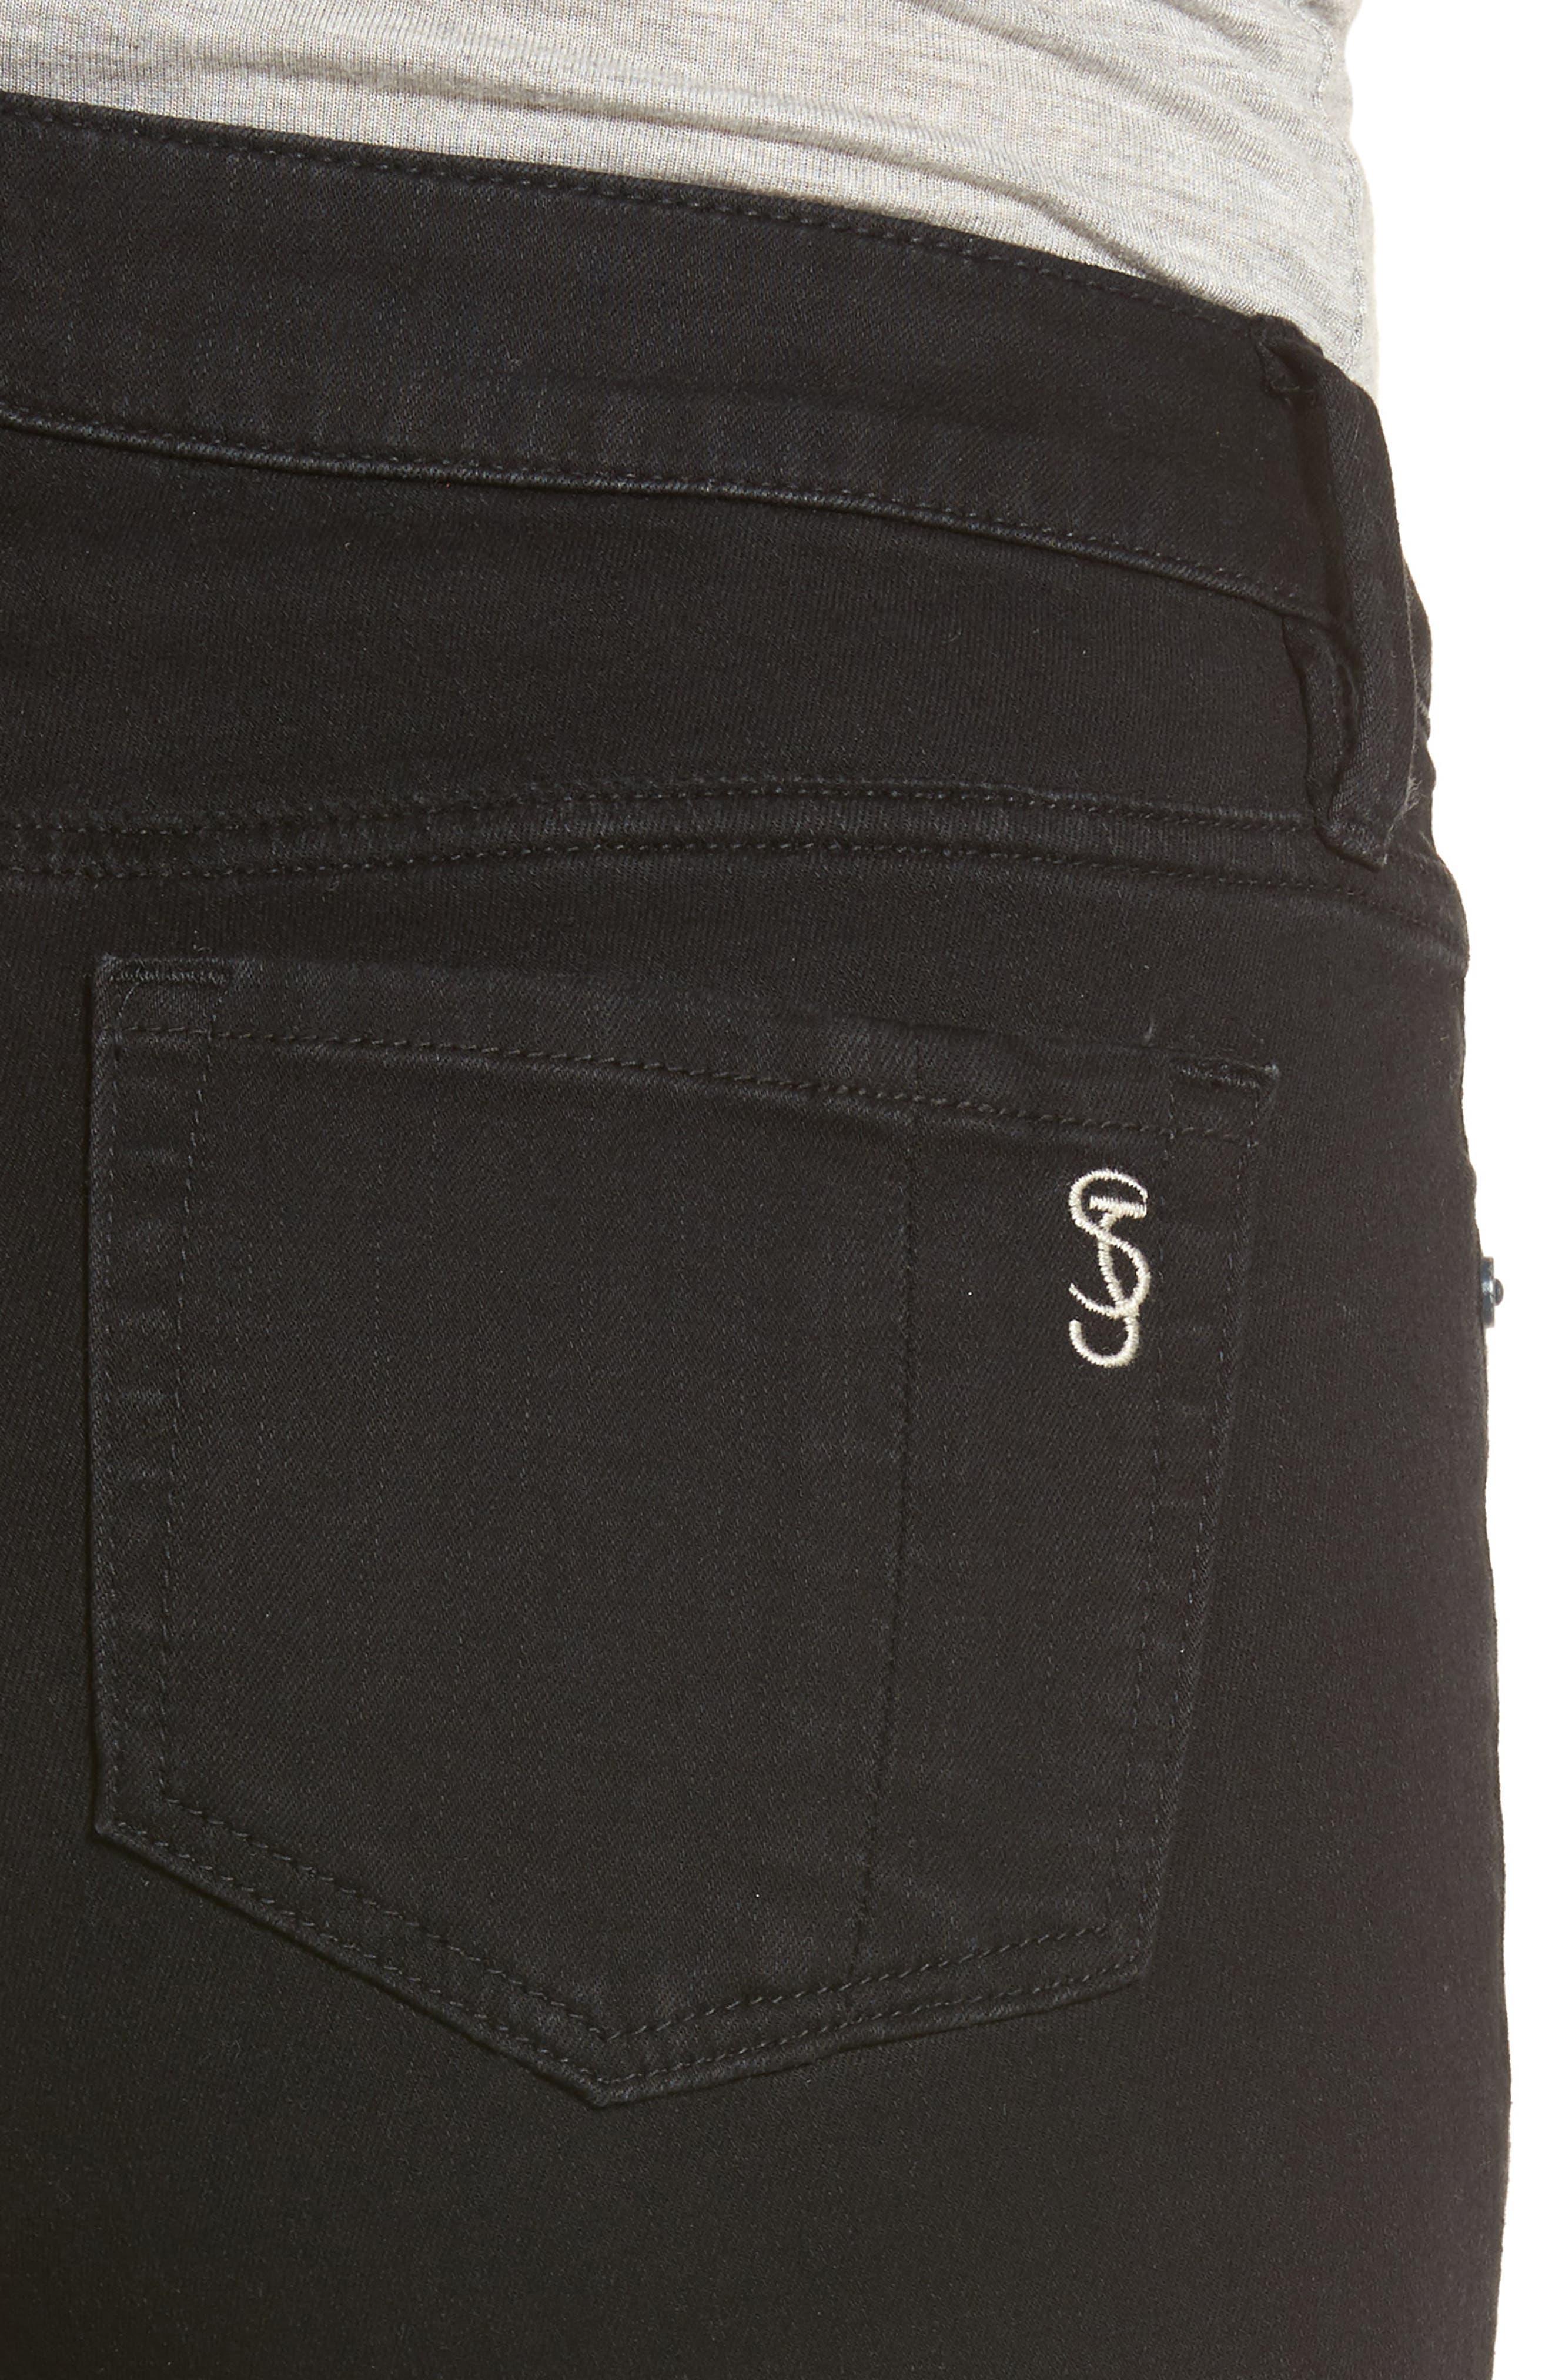 Slim Jeans,                             Alternate thumbnail 4, color,                             Black